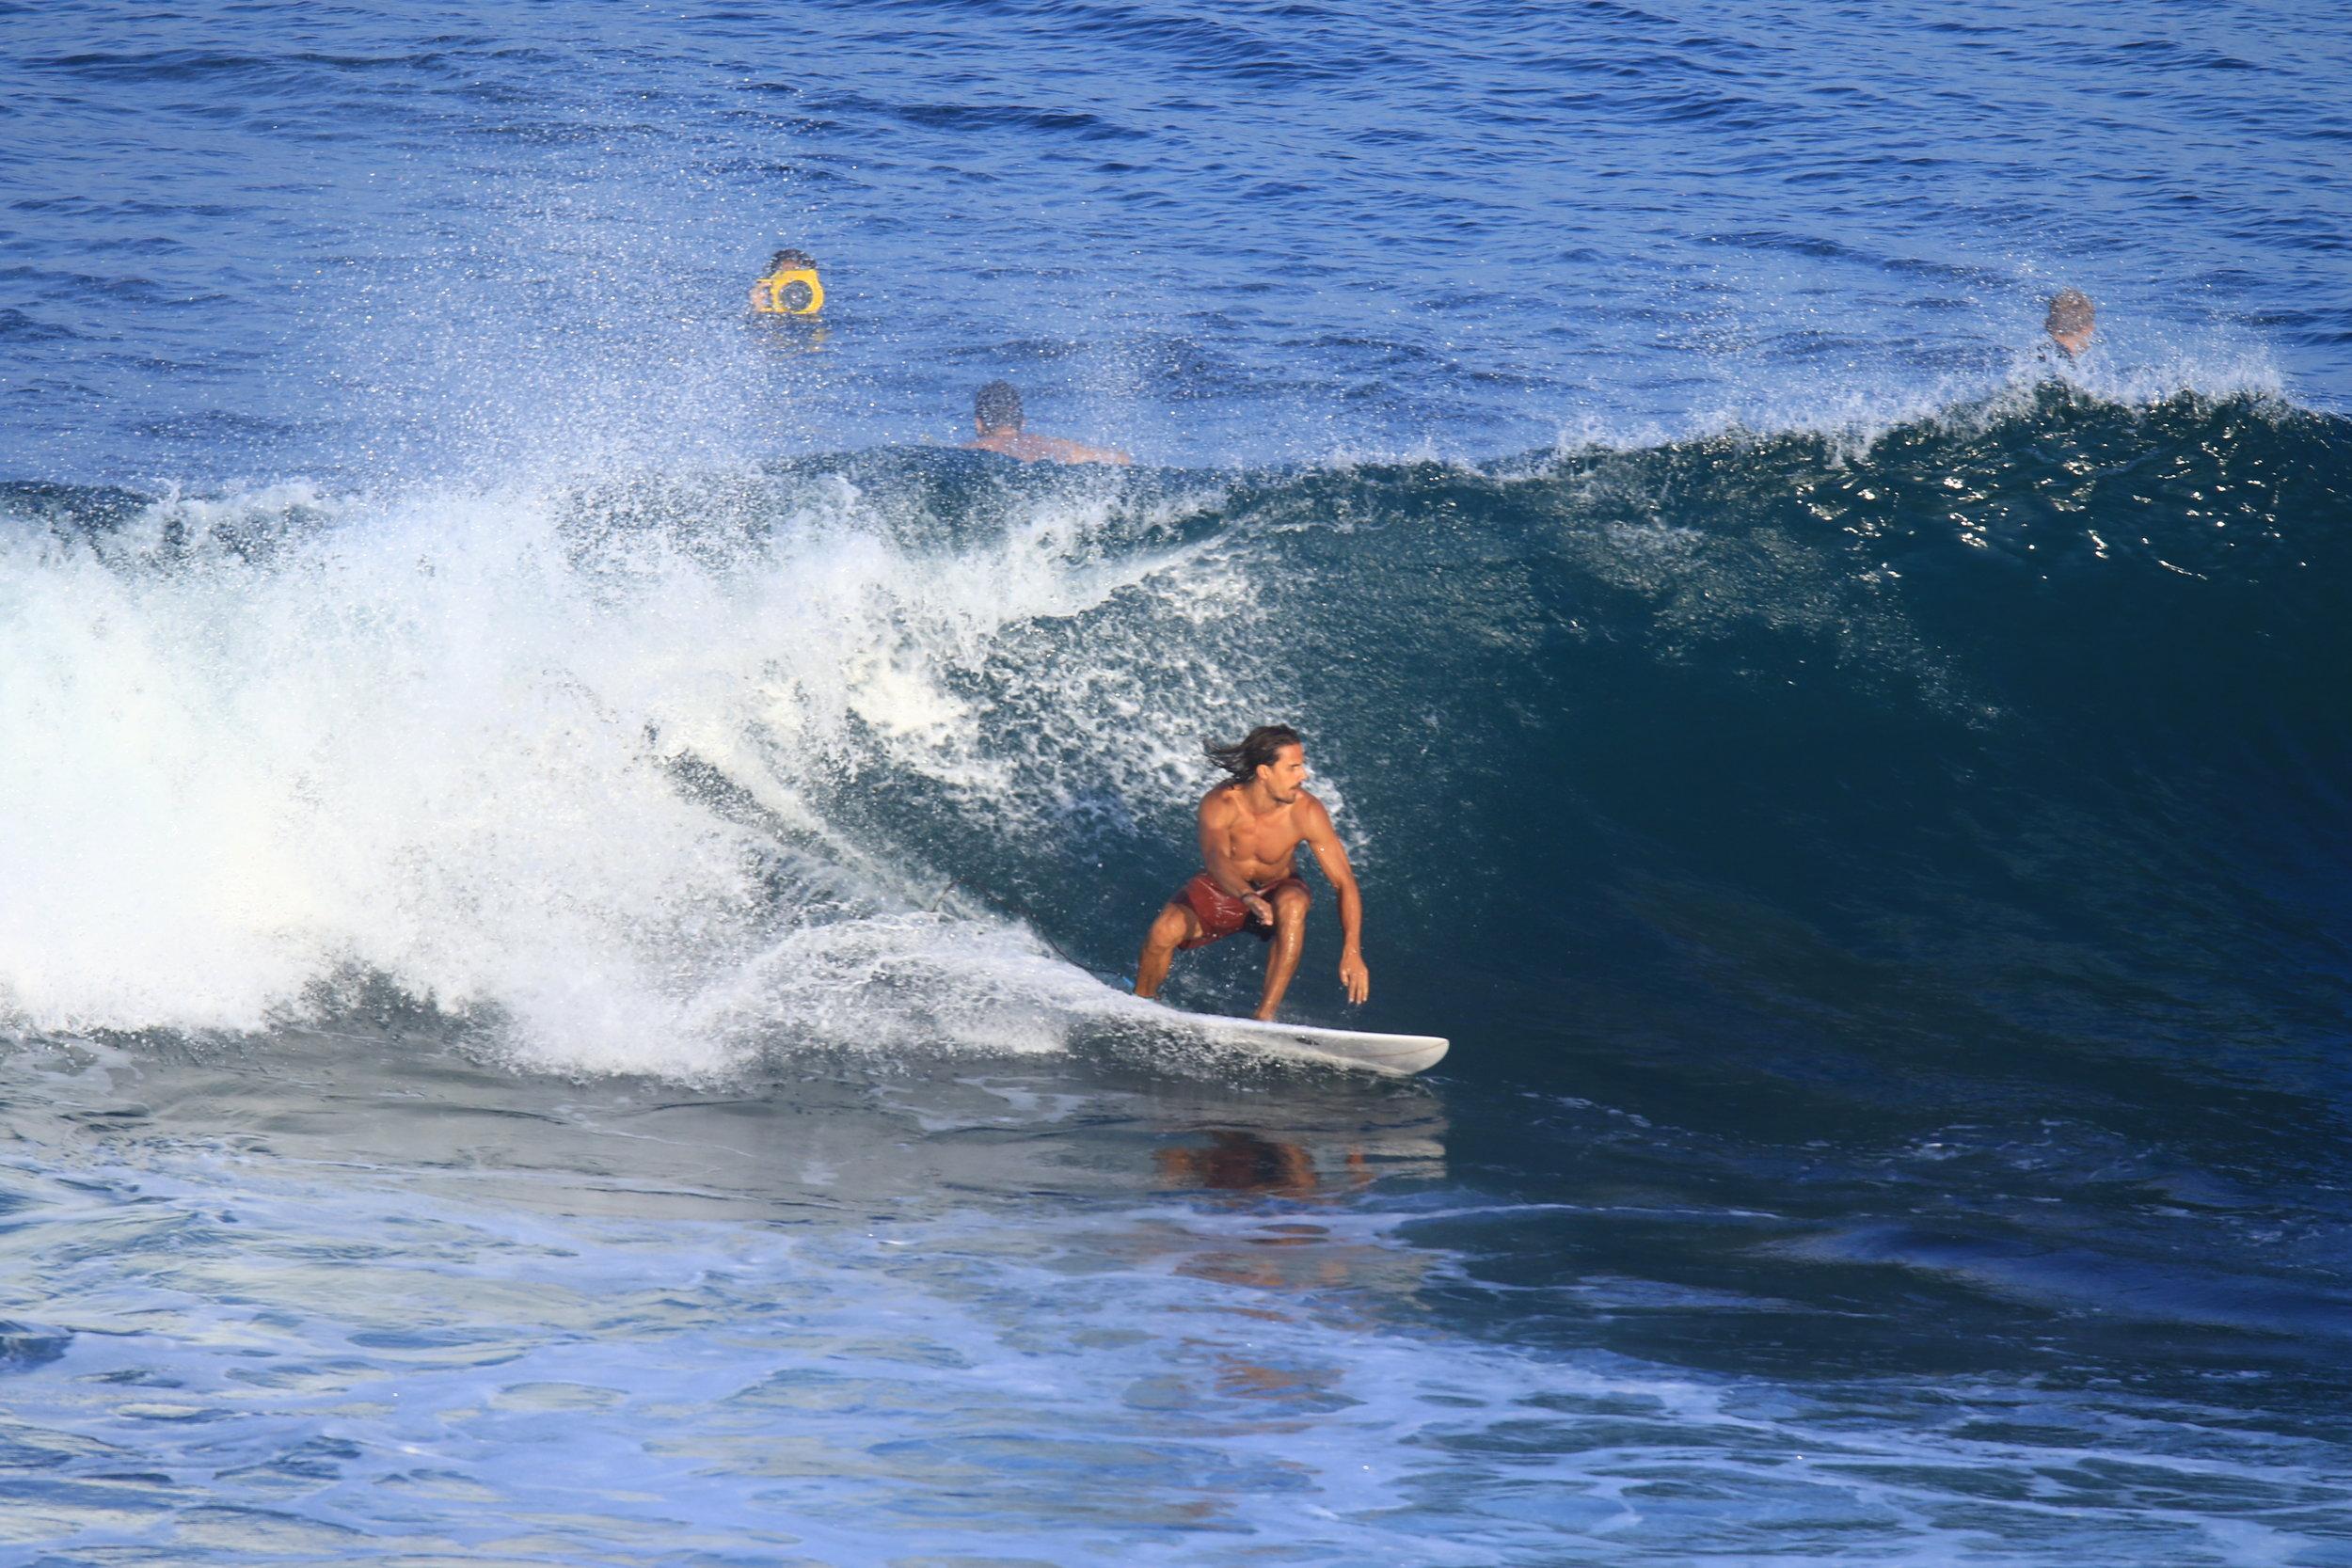 Mighty Otter Surfboards Lo Fi Indo Bali Lotta Surfs051A9275.JPG